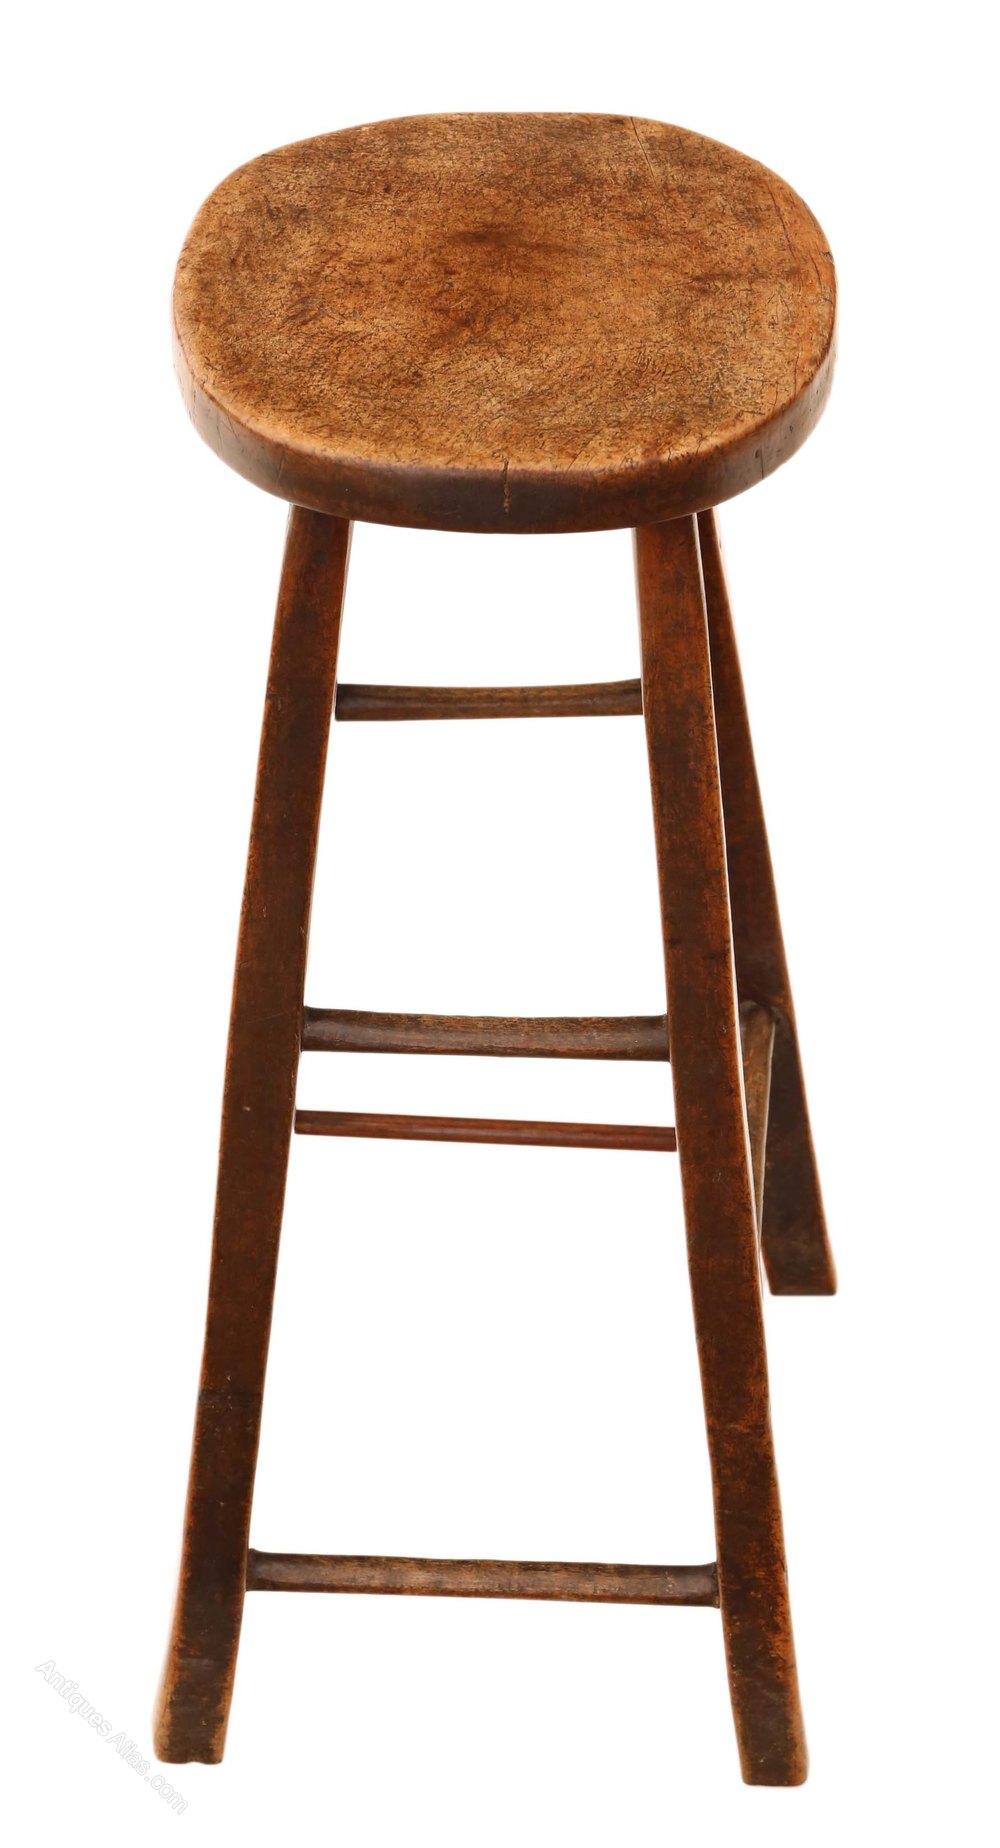 18th Century Mahogany High Stool Seat Chair Antiques Atlas